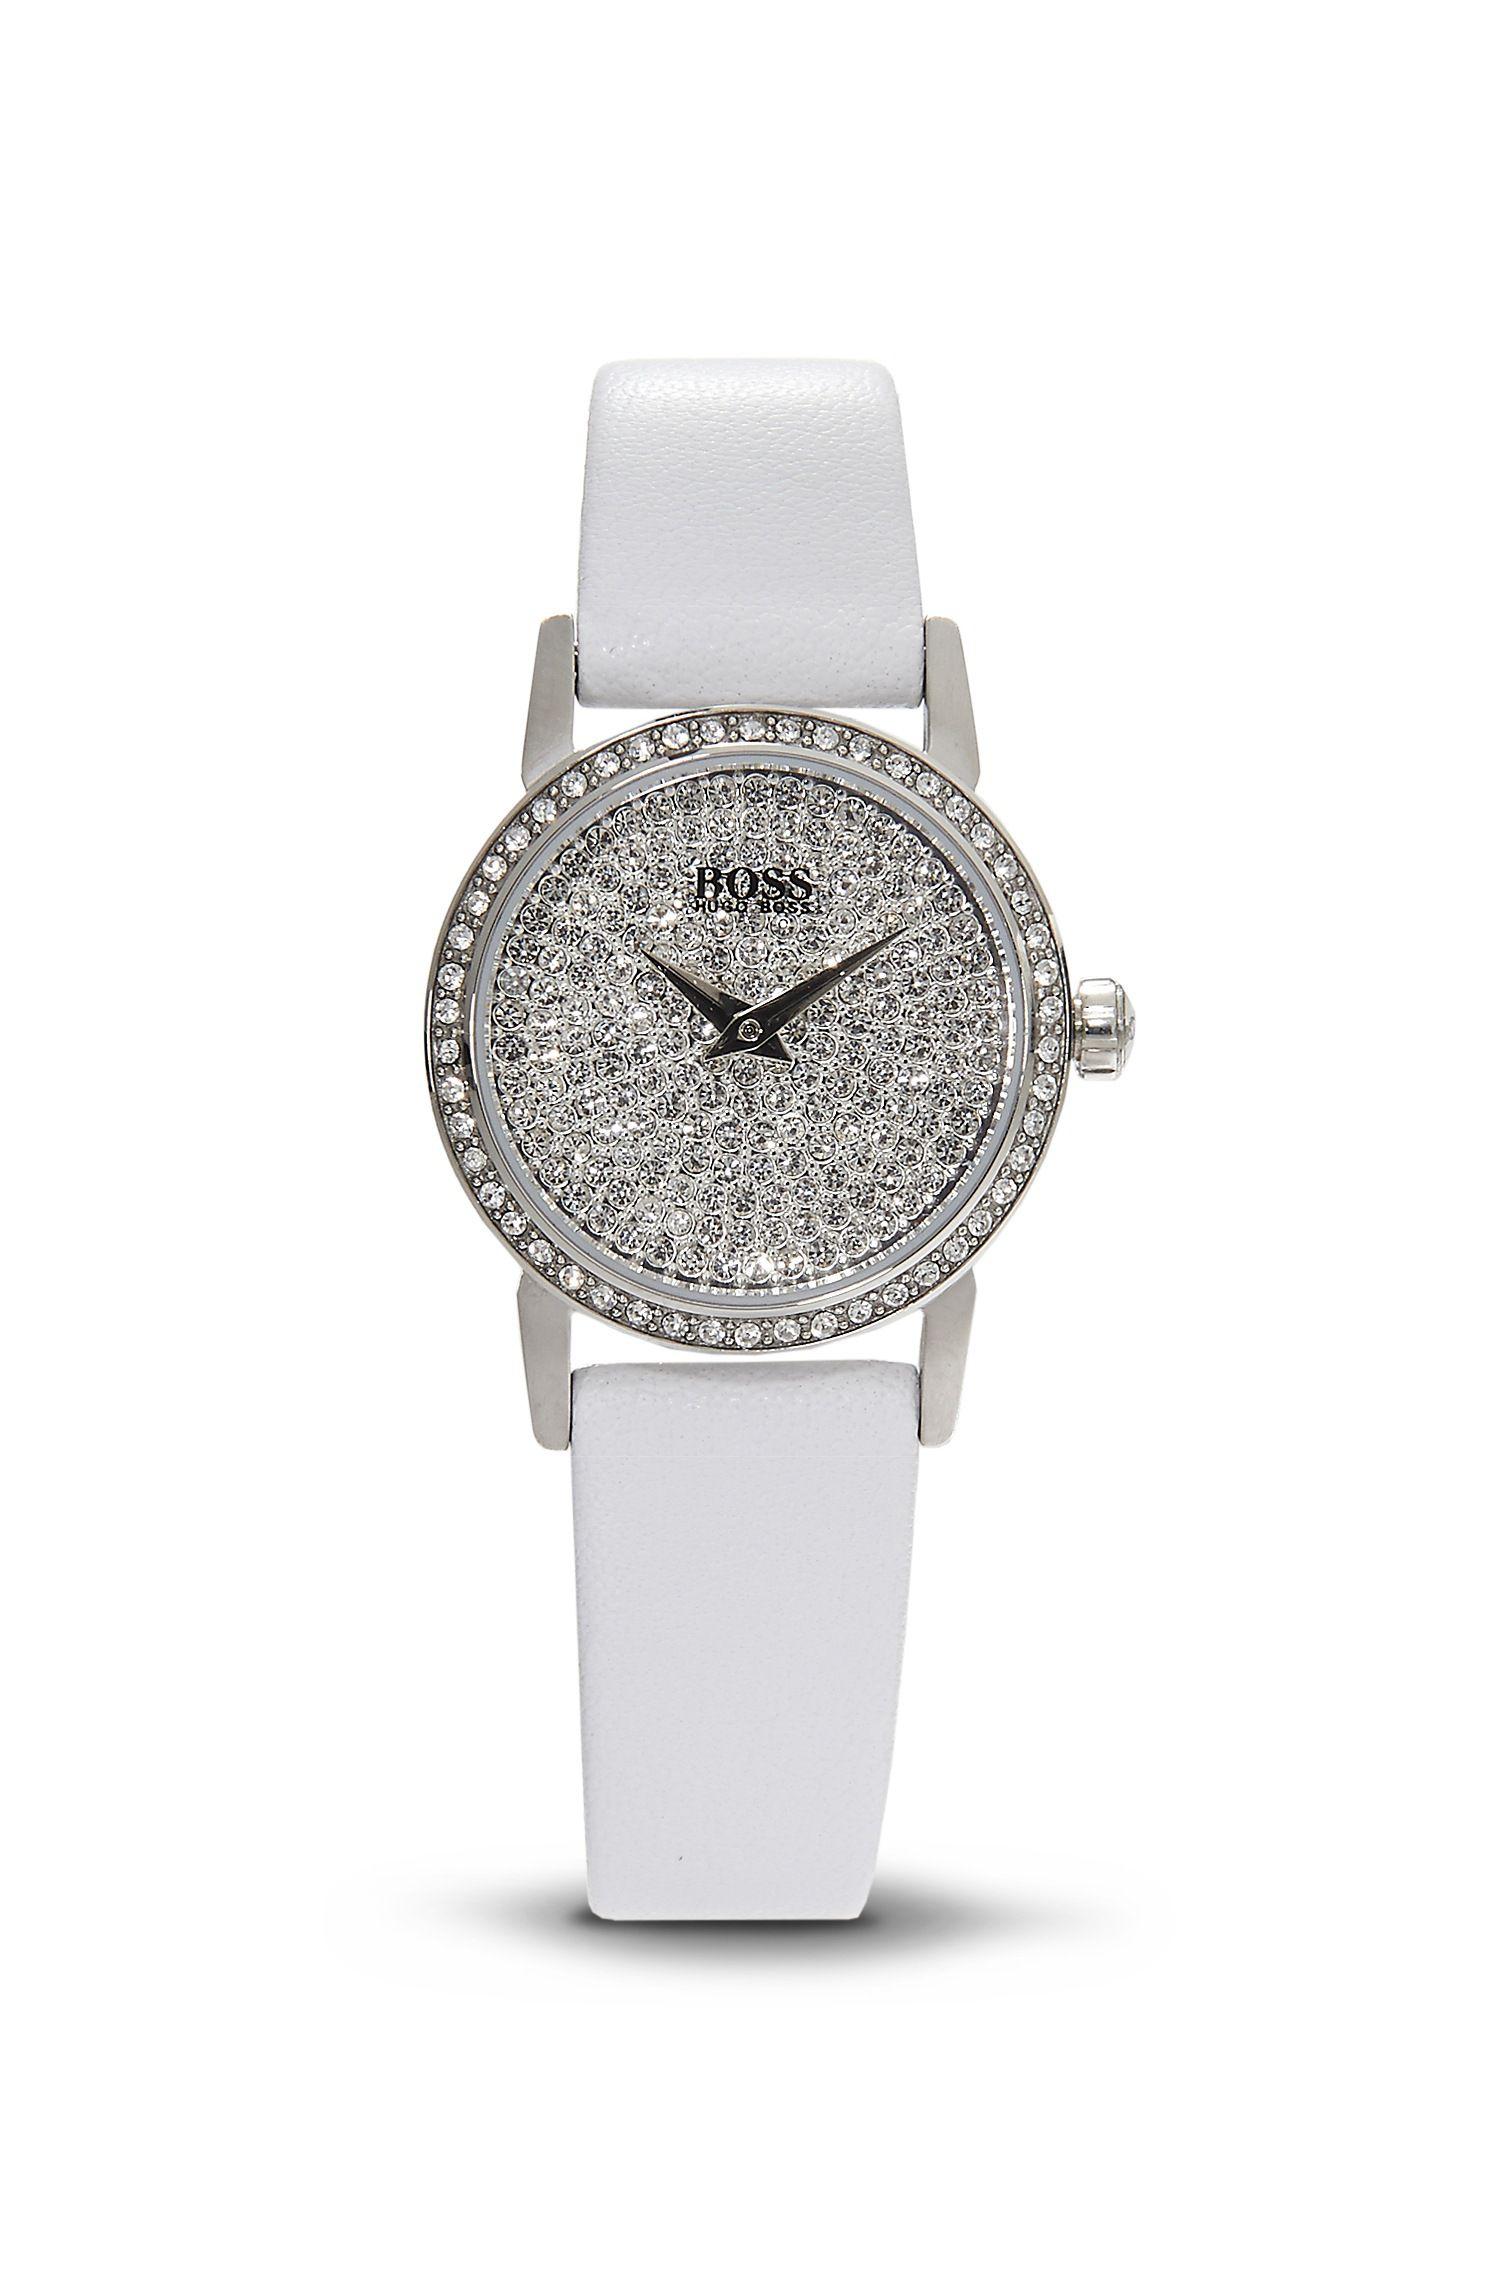 '1502358' | White Leather Strap Swarovski Crystal-Embellished Watch